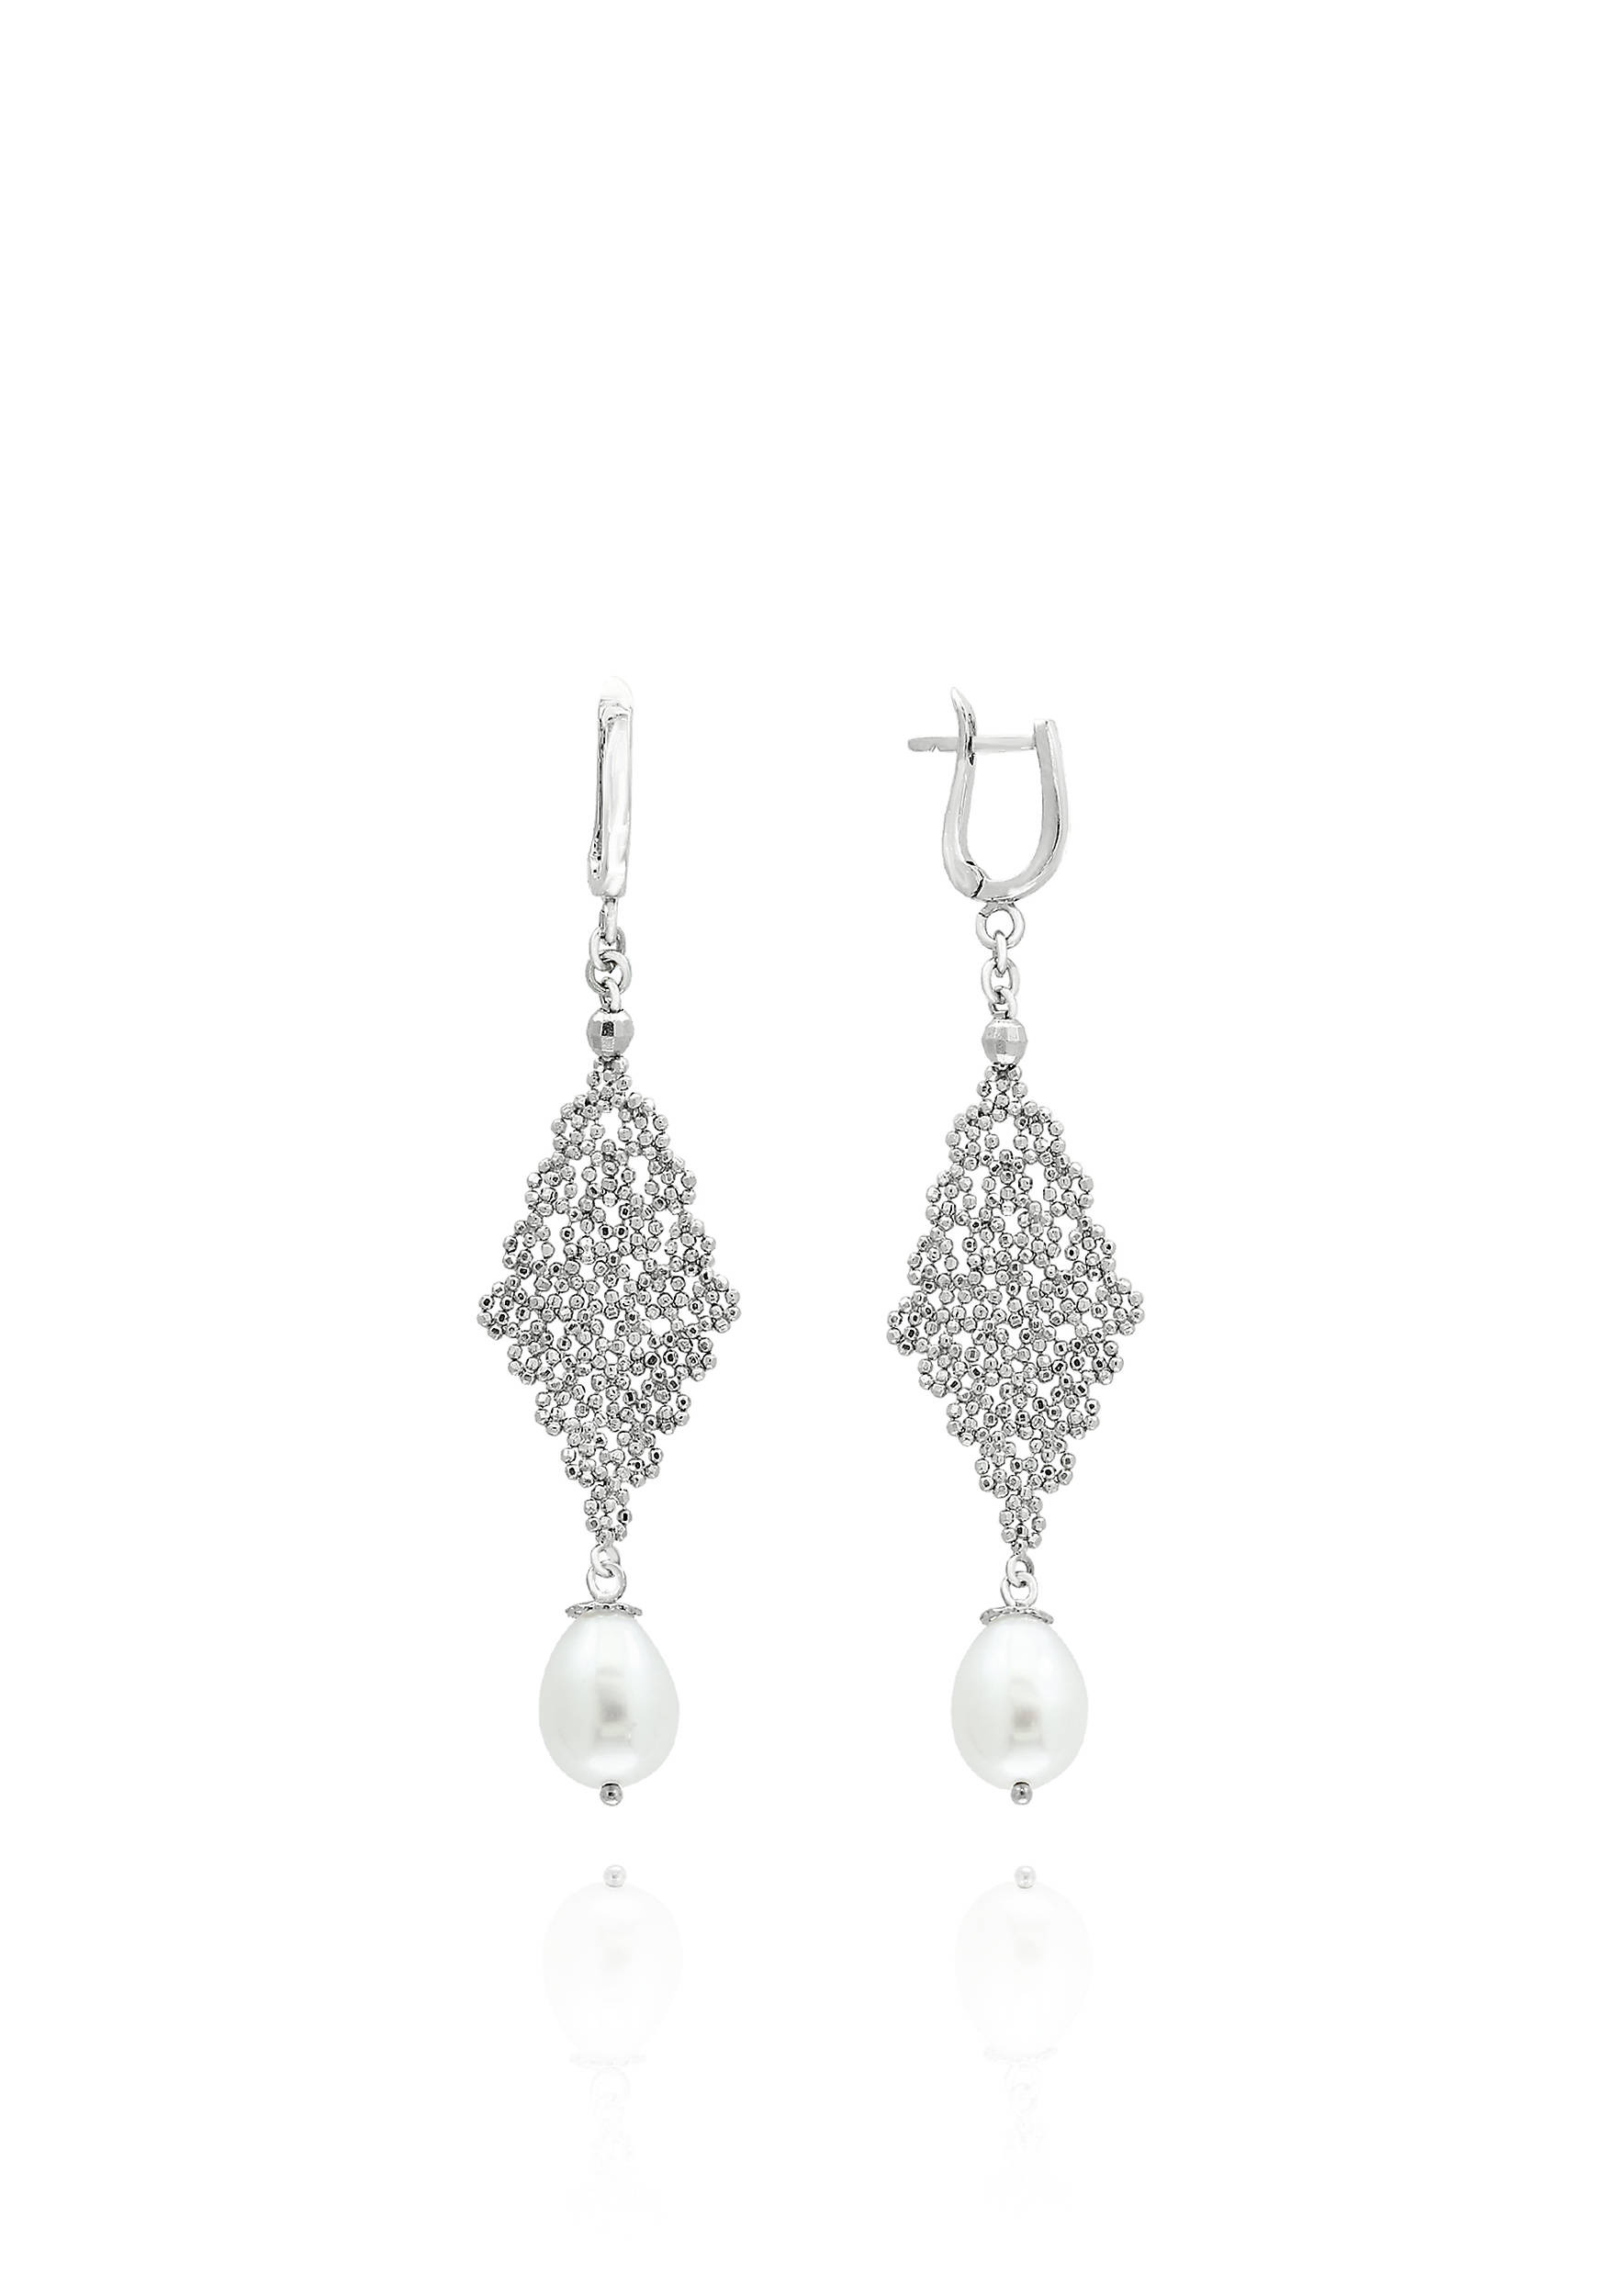 Effy® Oval Freshwater Pearl Earrings In Sterling Silver 5400451ies0j288j2  Images